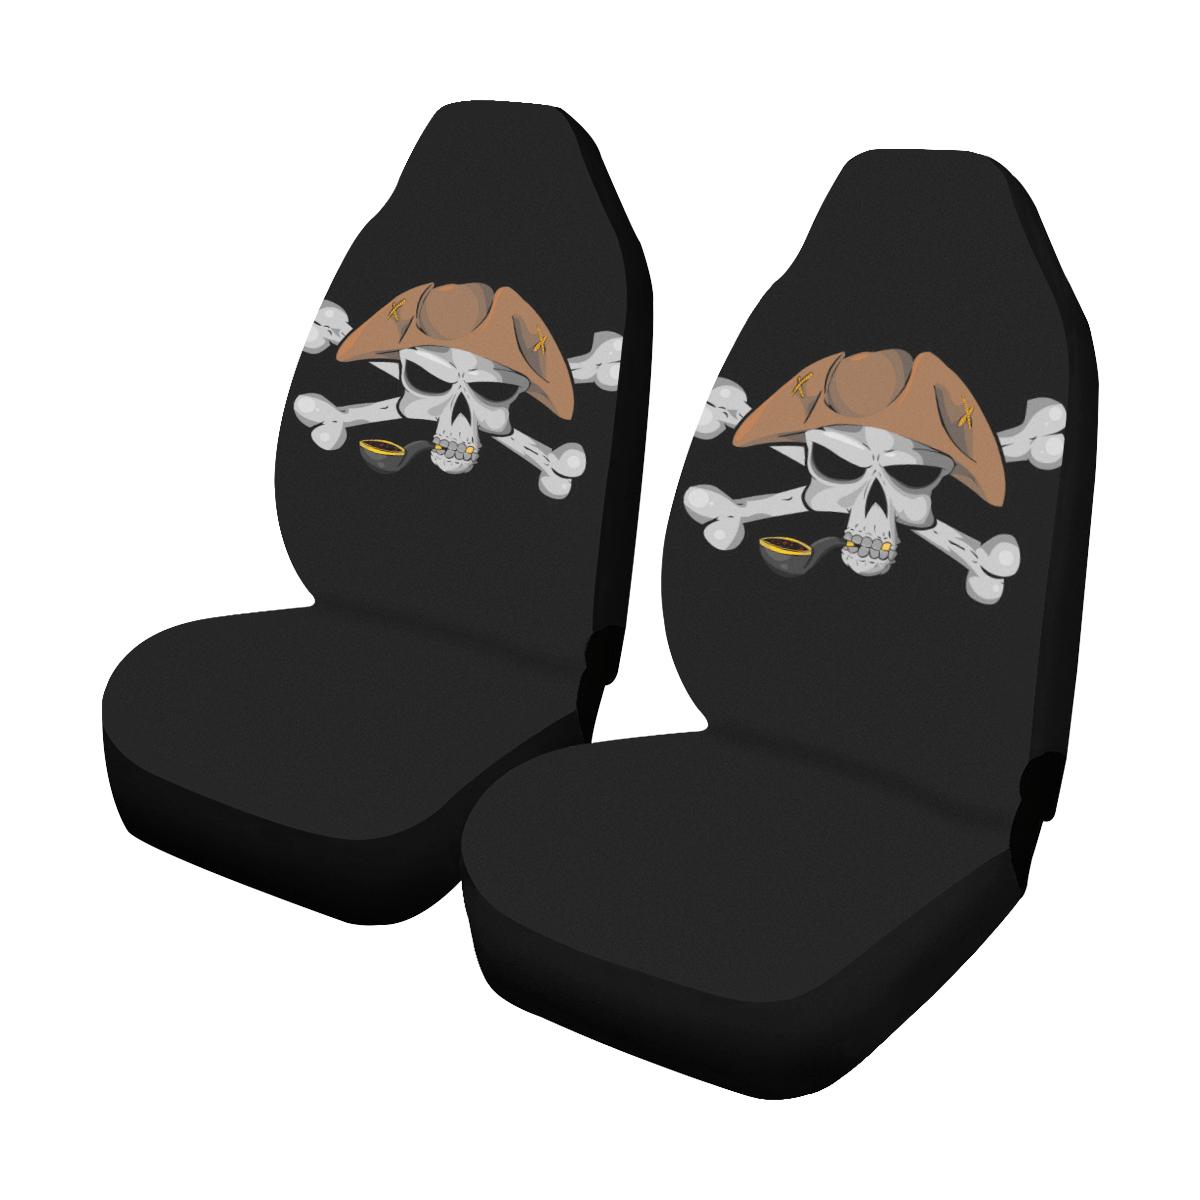 Awe Inspiring Pirate Skull 354246 Car Seat Covers Set Of 2 Beautiful Dailytribune Chair Design For Home Dailytribuneorg